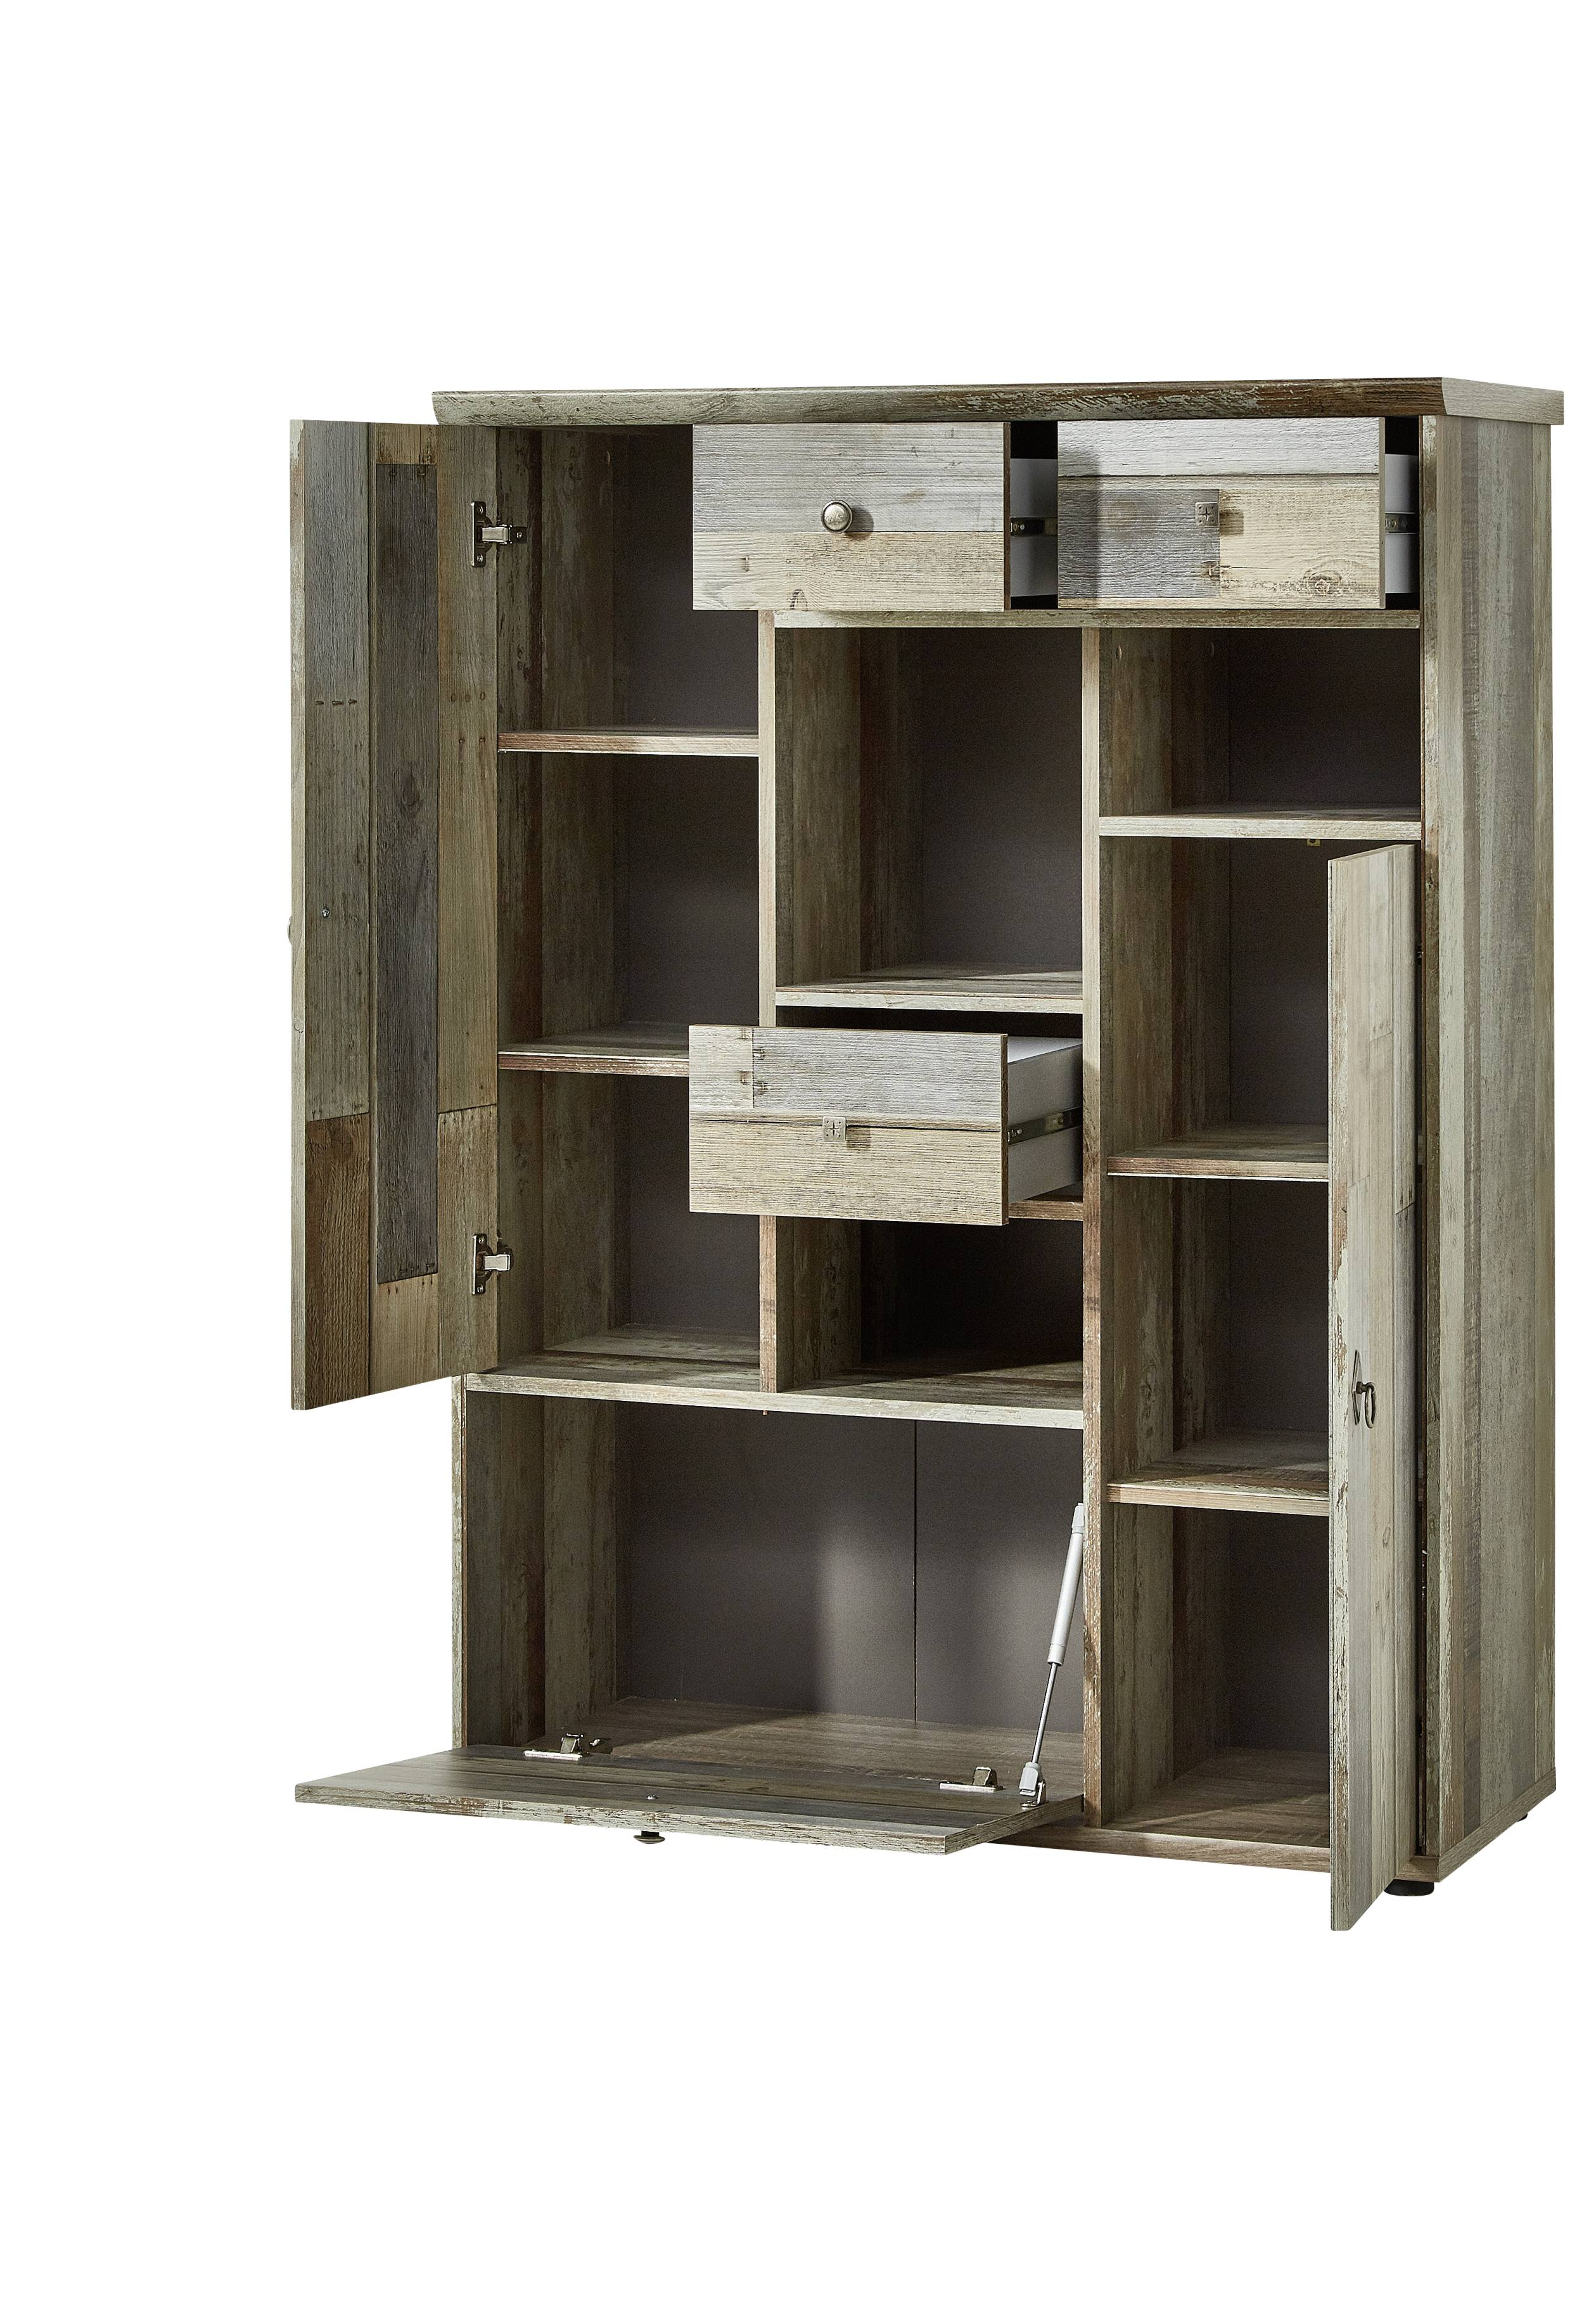 wohnwand wohnzimmer set vitrine lowboard wandregal tv. Black Bedroom Furniture Sets. Home Design Ideas